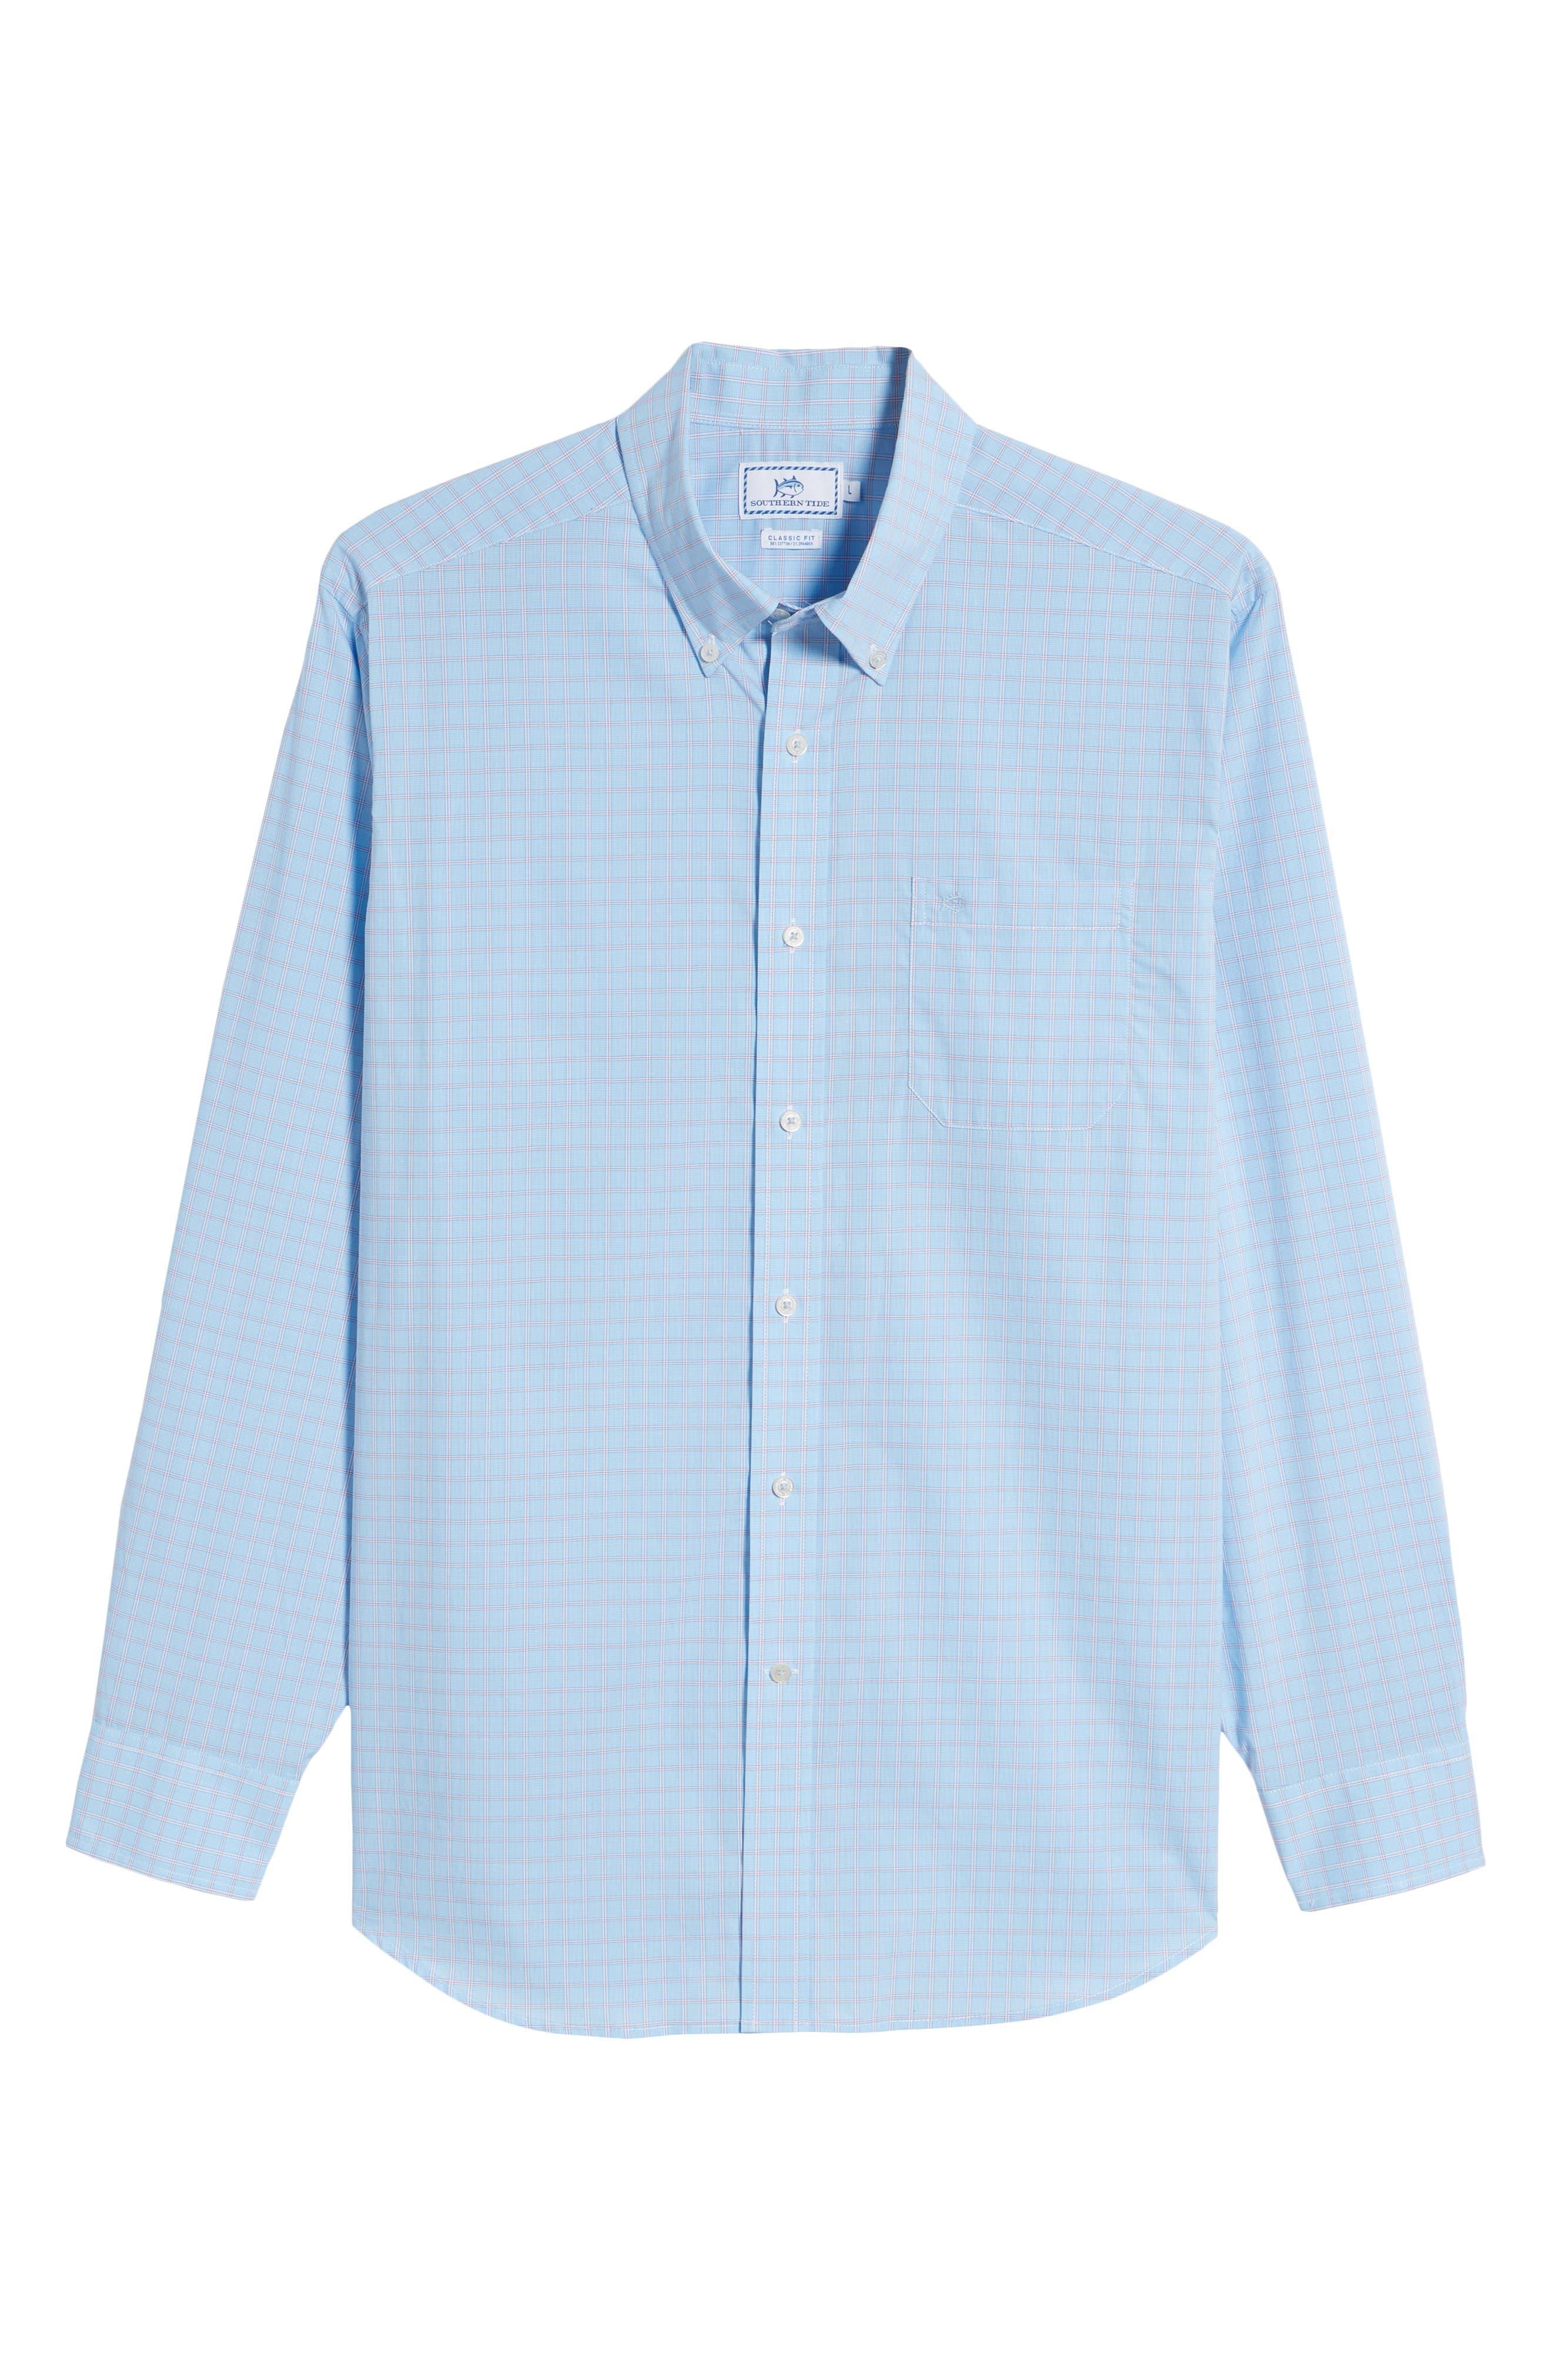 Buck Island Regular Fit Stretch Check Sport Shirt,                             Alternate thumbnail 6, color,                             Blue Stream